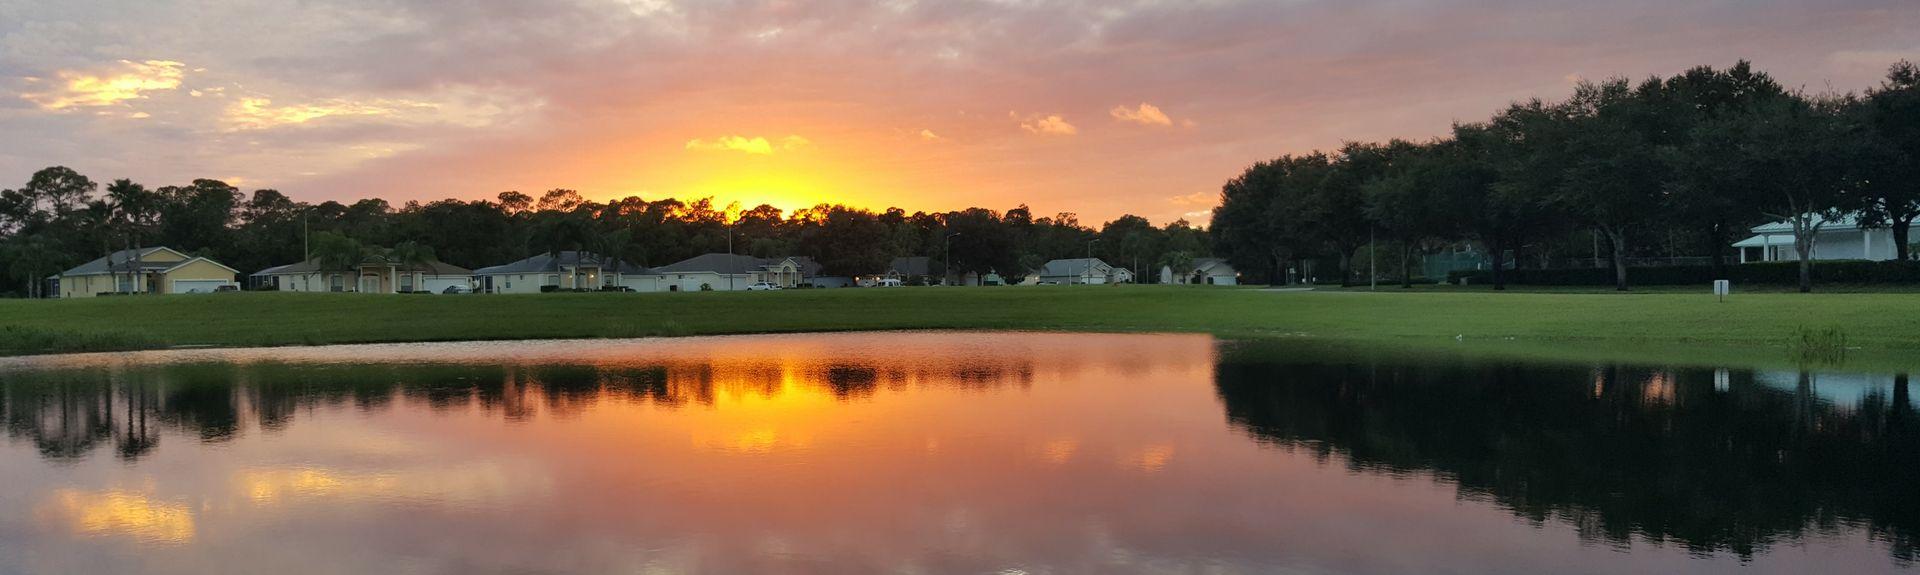 Windwood Bay, Davenport, Florida, Estados Unidos